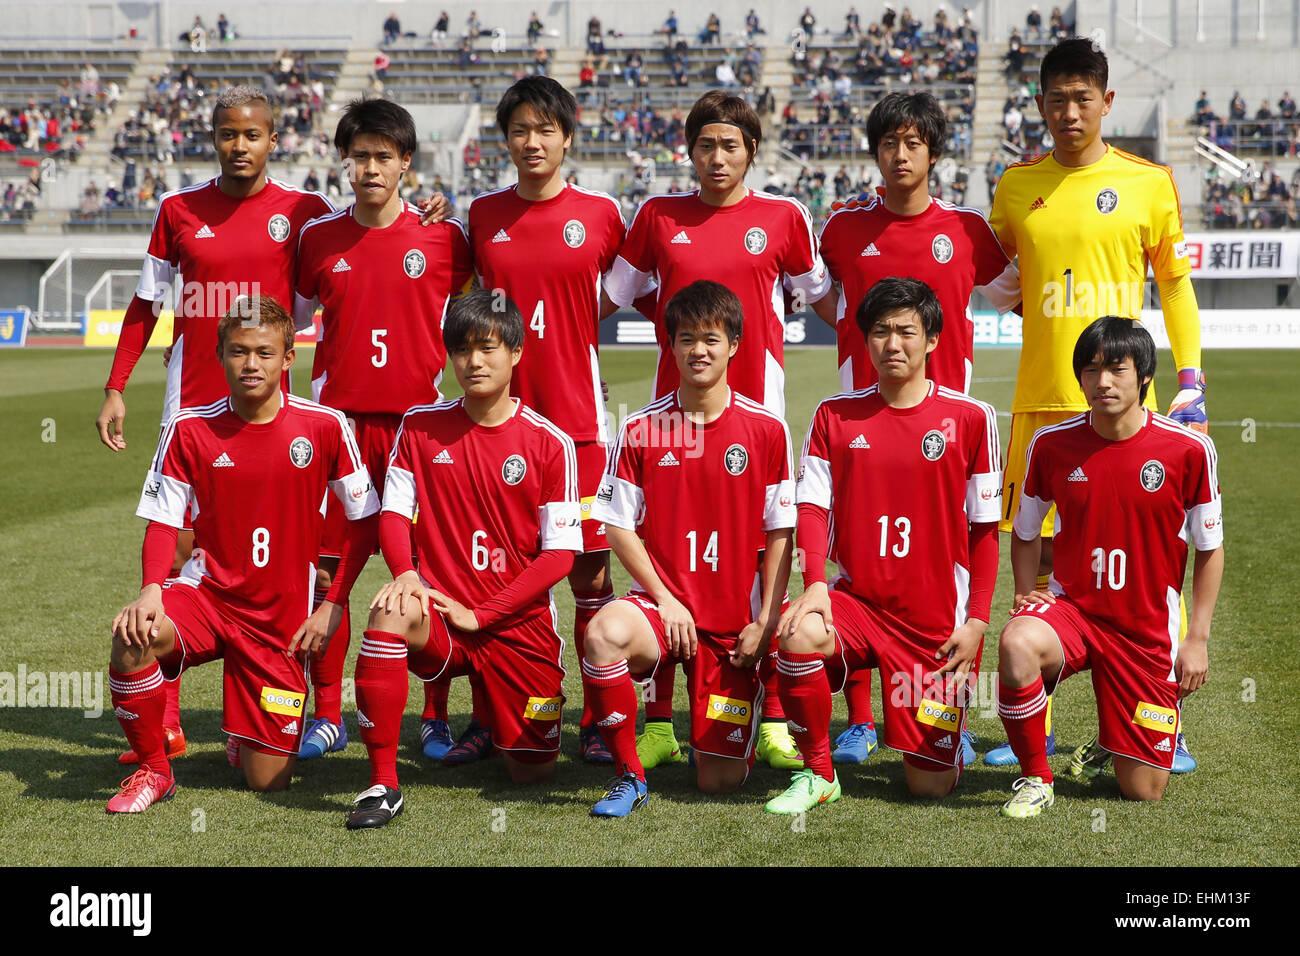 Kanagawa Japan 15th Mar 2015 U 22 J League Selection Team Group